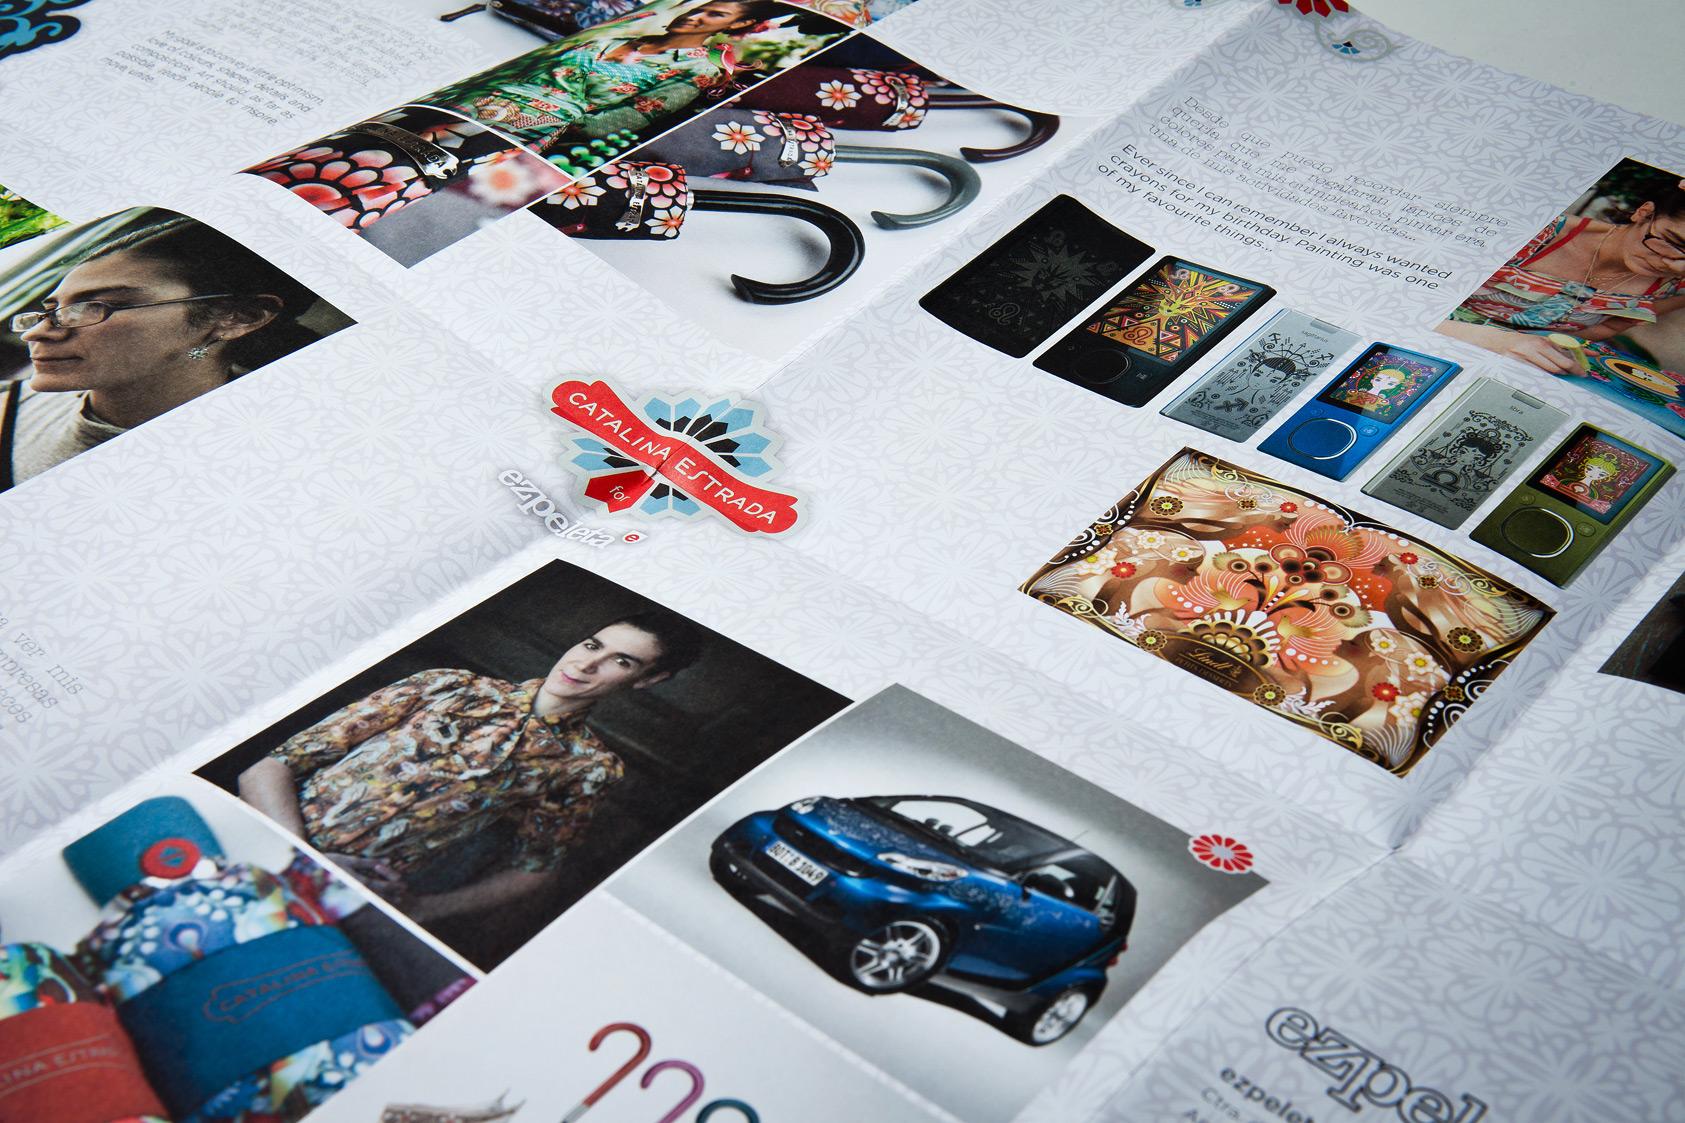 lombok_design_marketing_blog_ezpeleta_catalogos_4